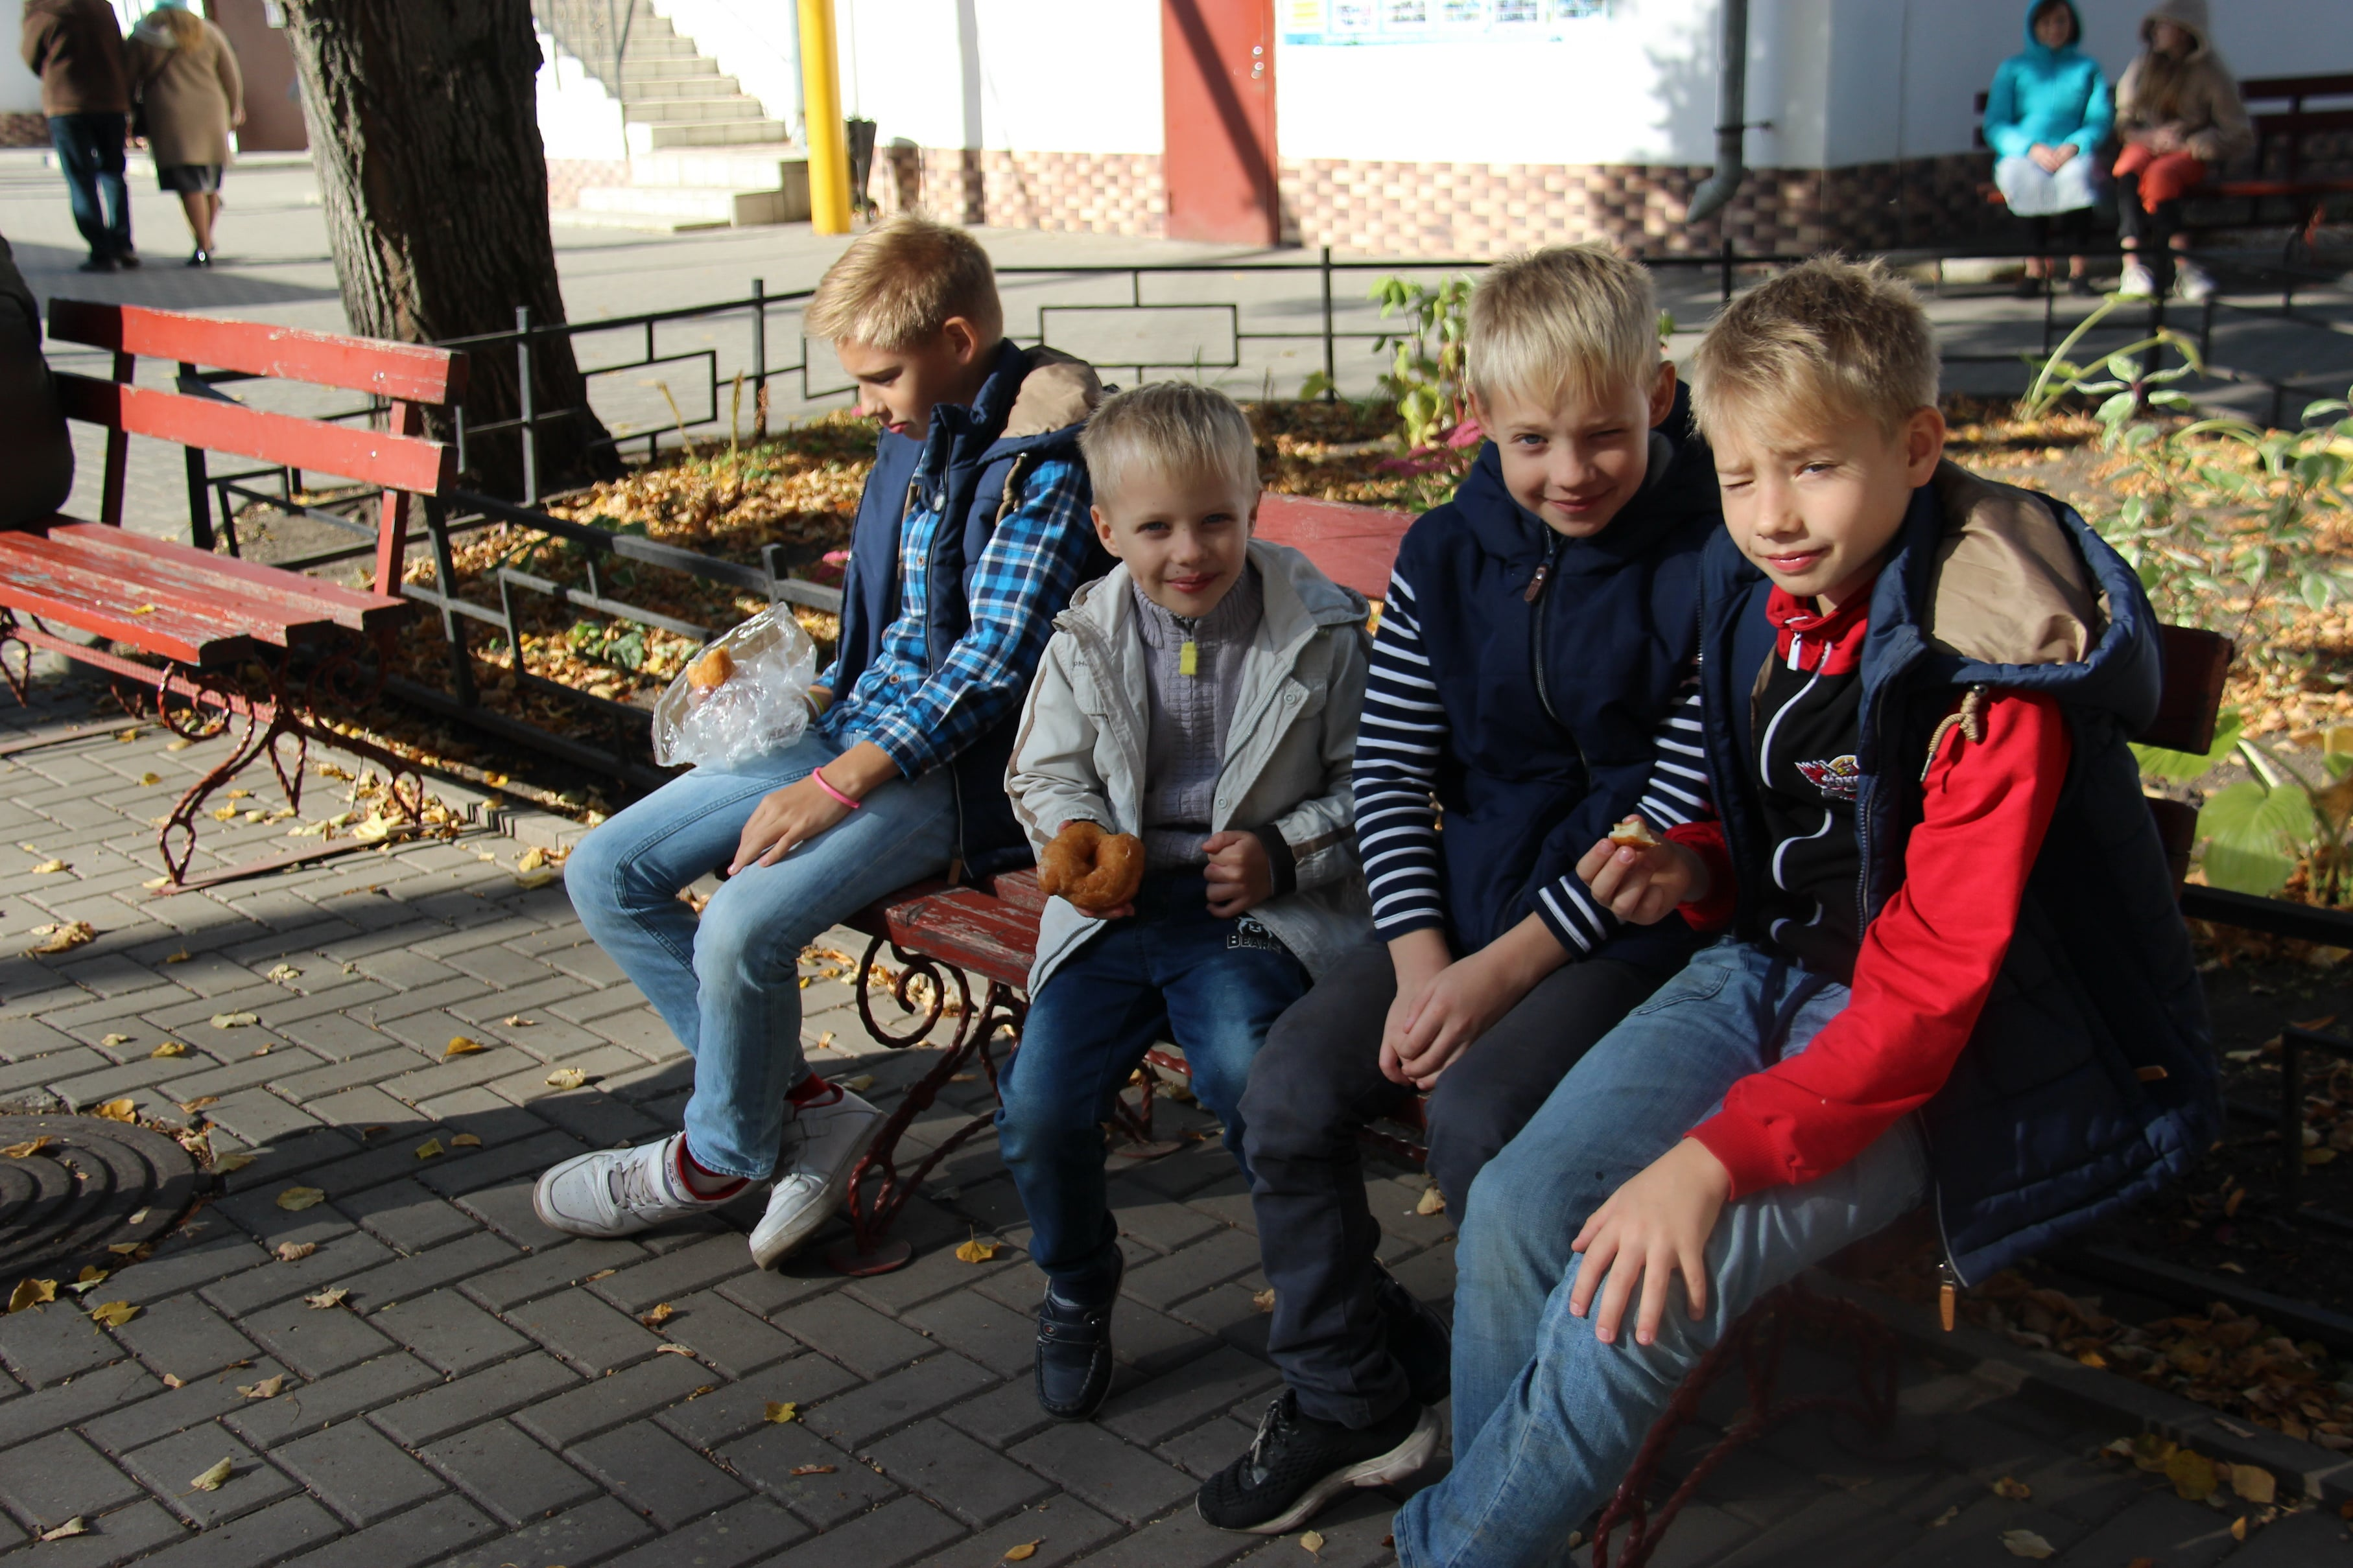 http://monuspen.ru/photoreports/e401677122761d37dfe502f281289bh3.JPG